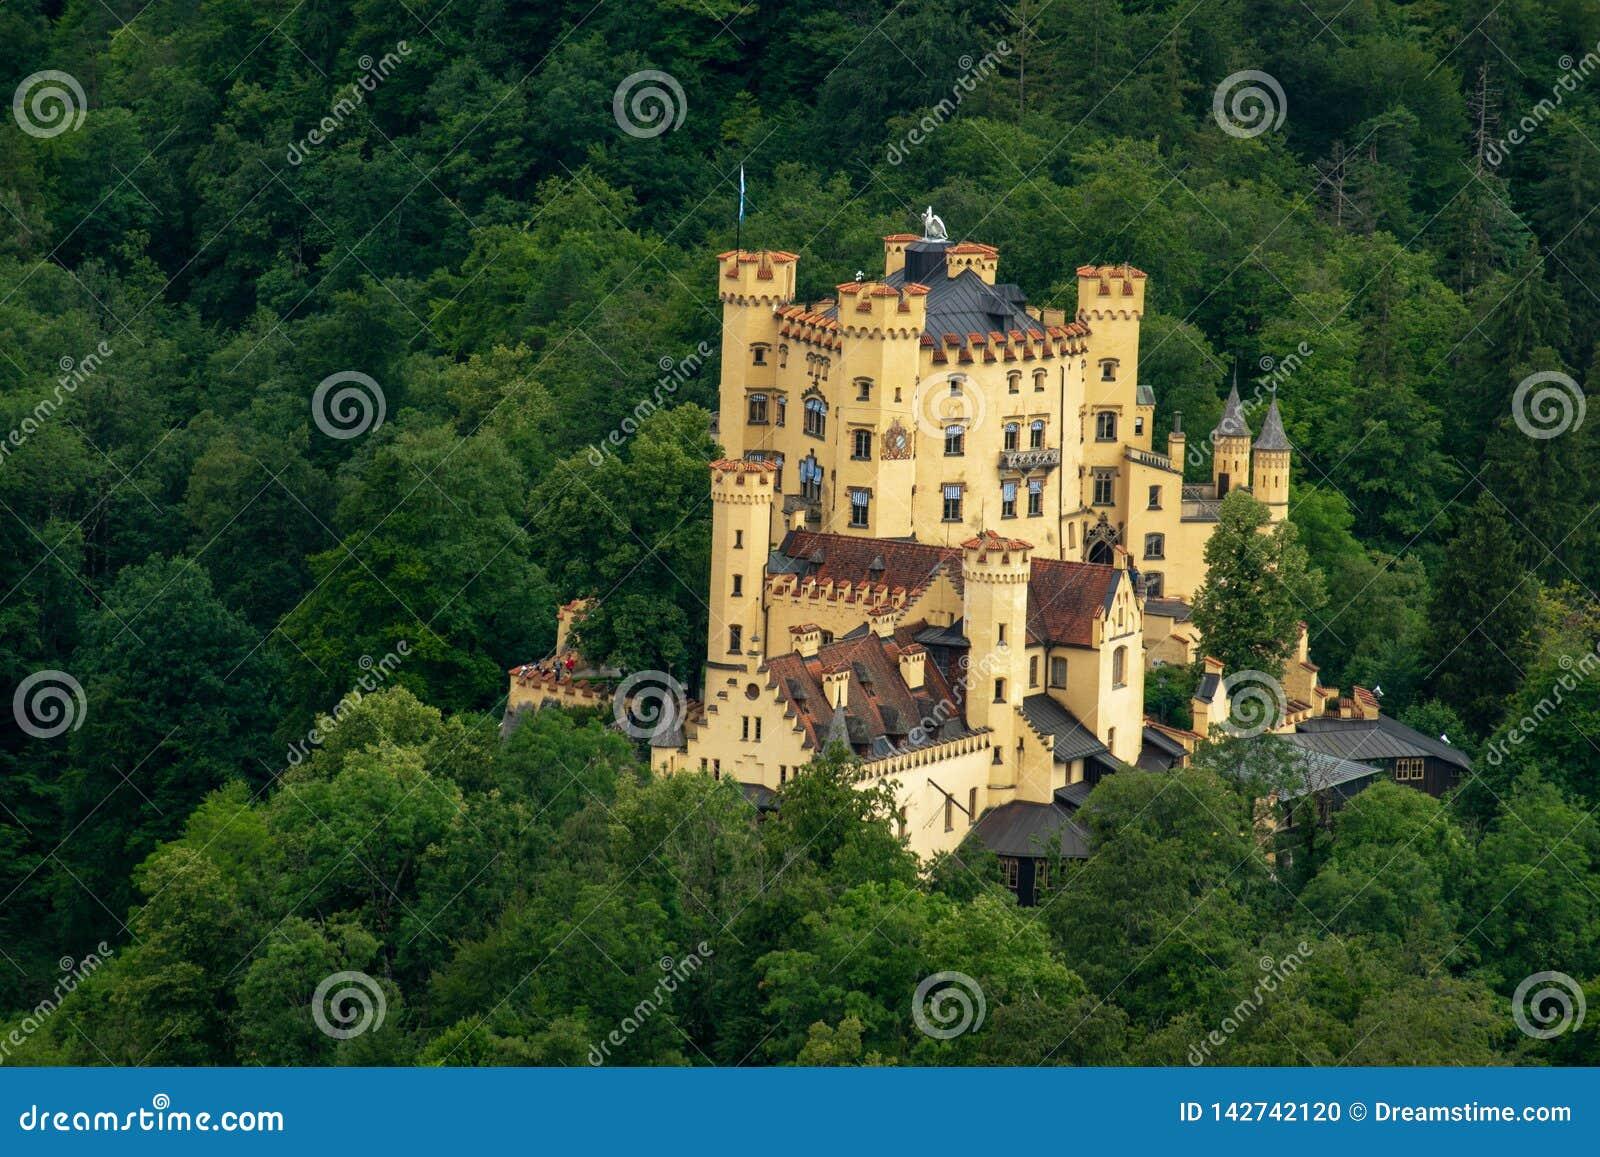 Slott i mitt av en skog i Tyskland